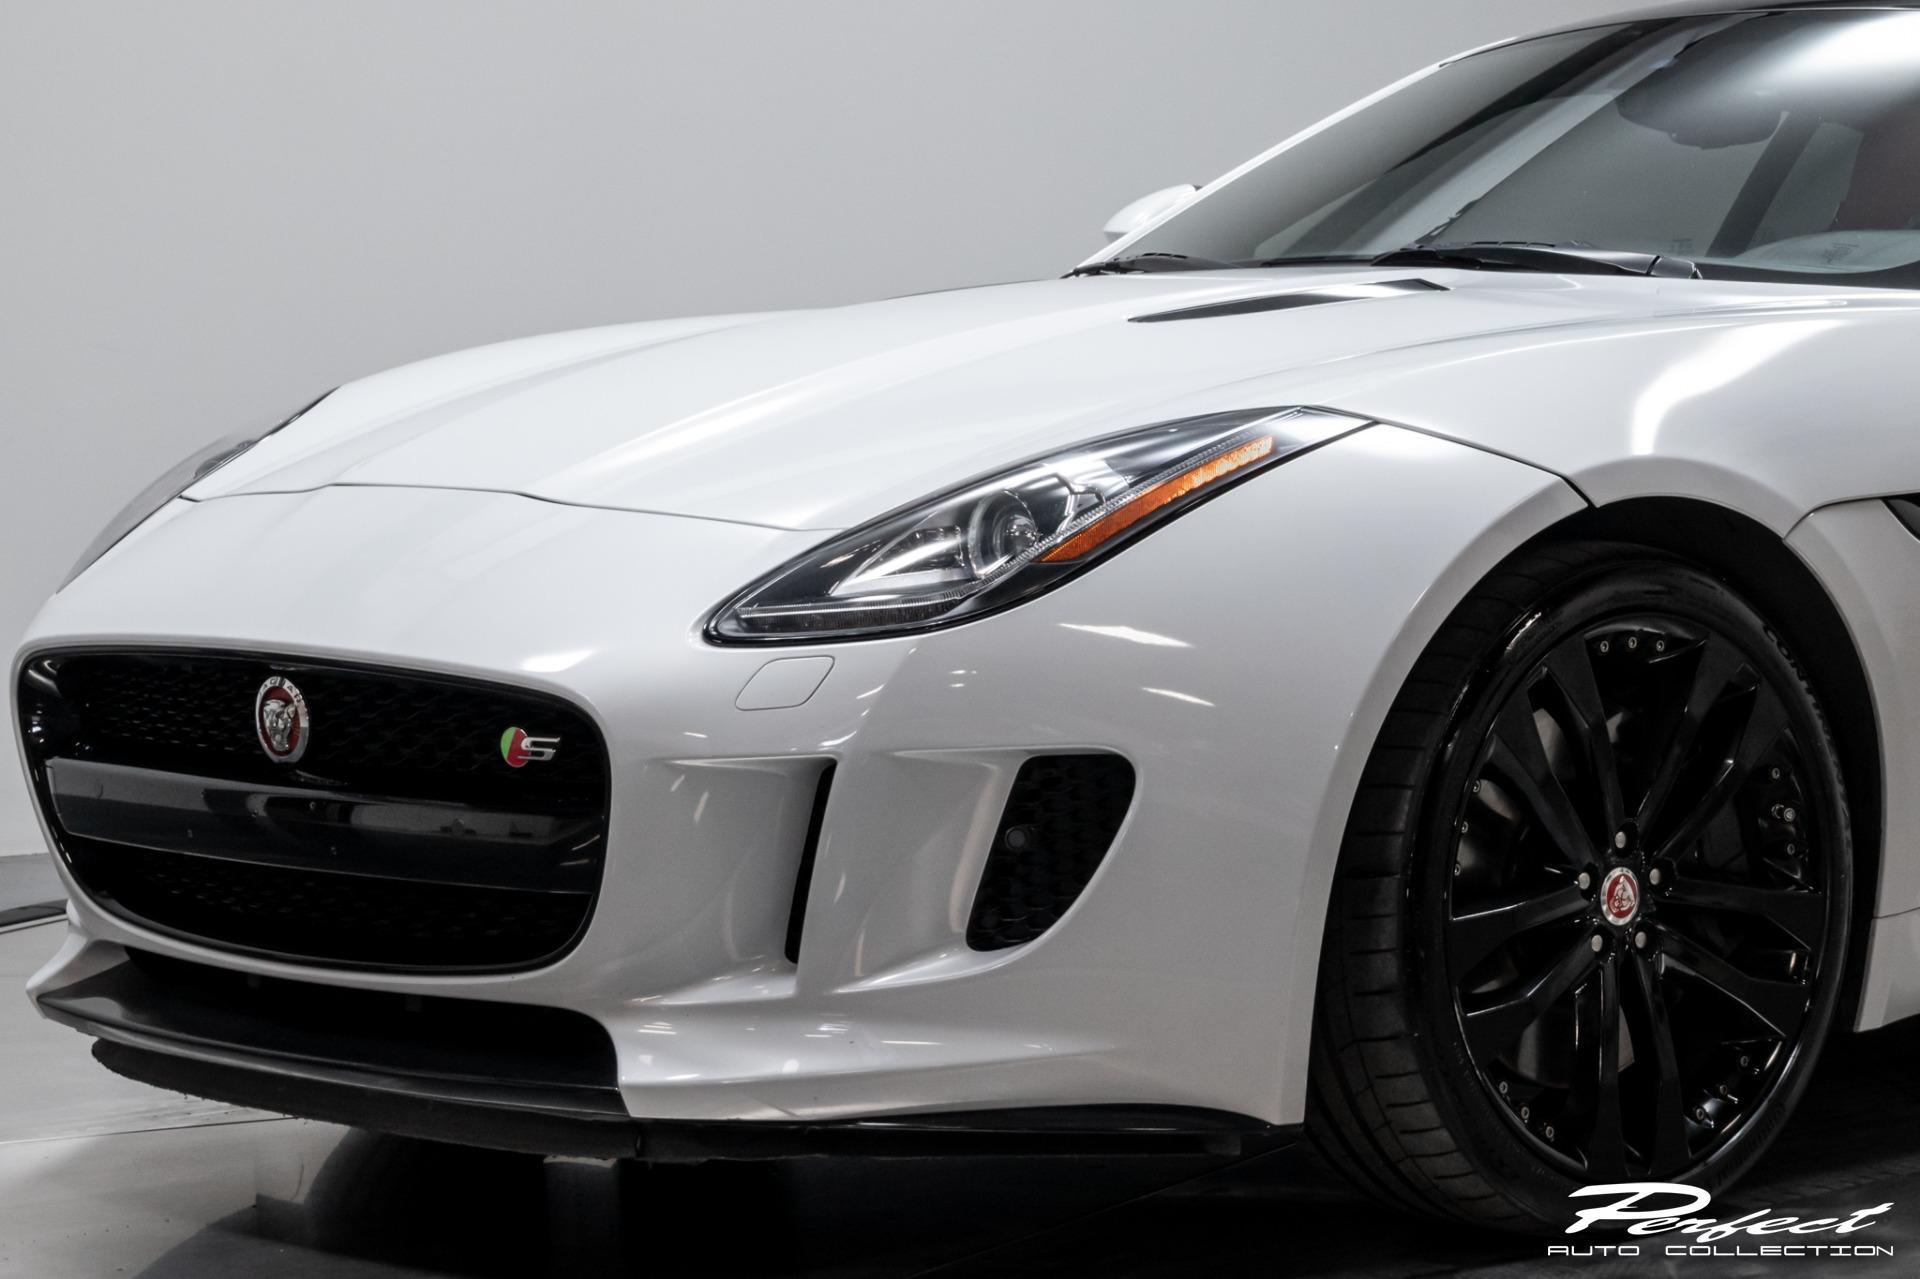 Used 2016 Jaguar F TYPE S